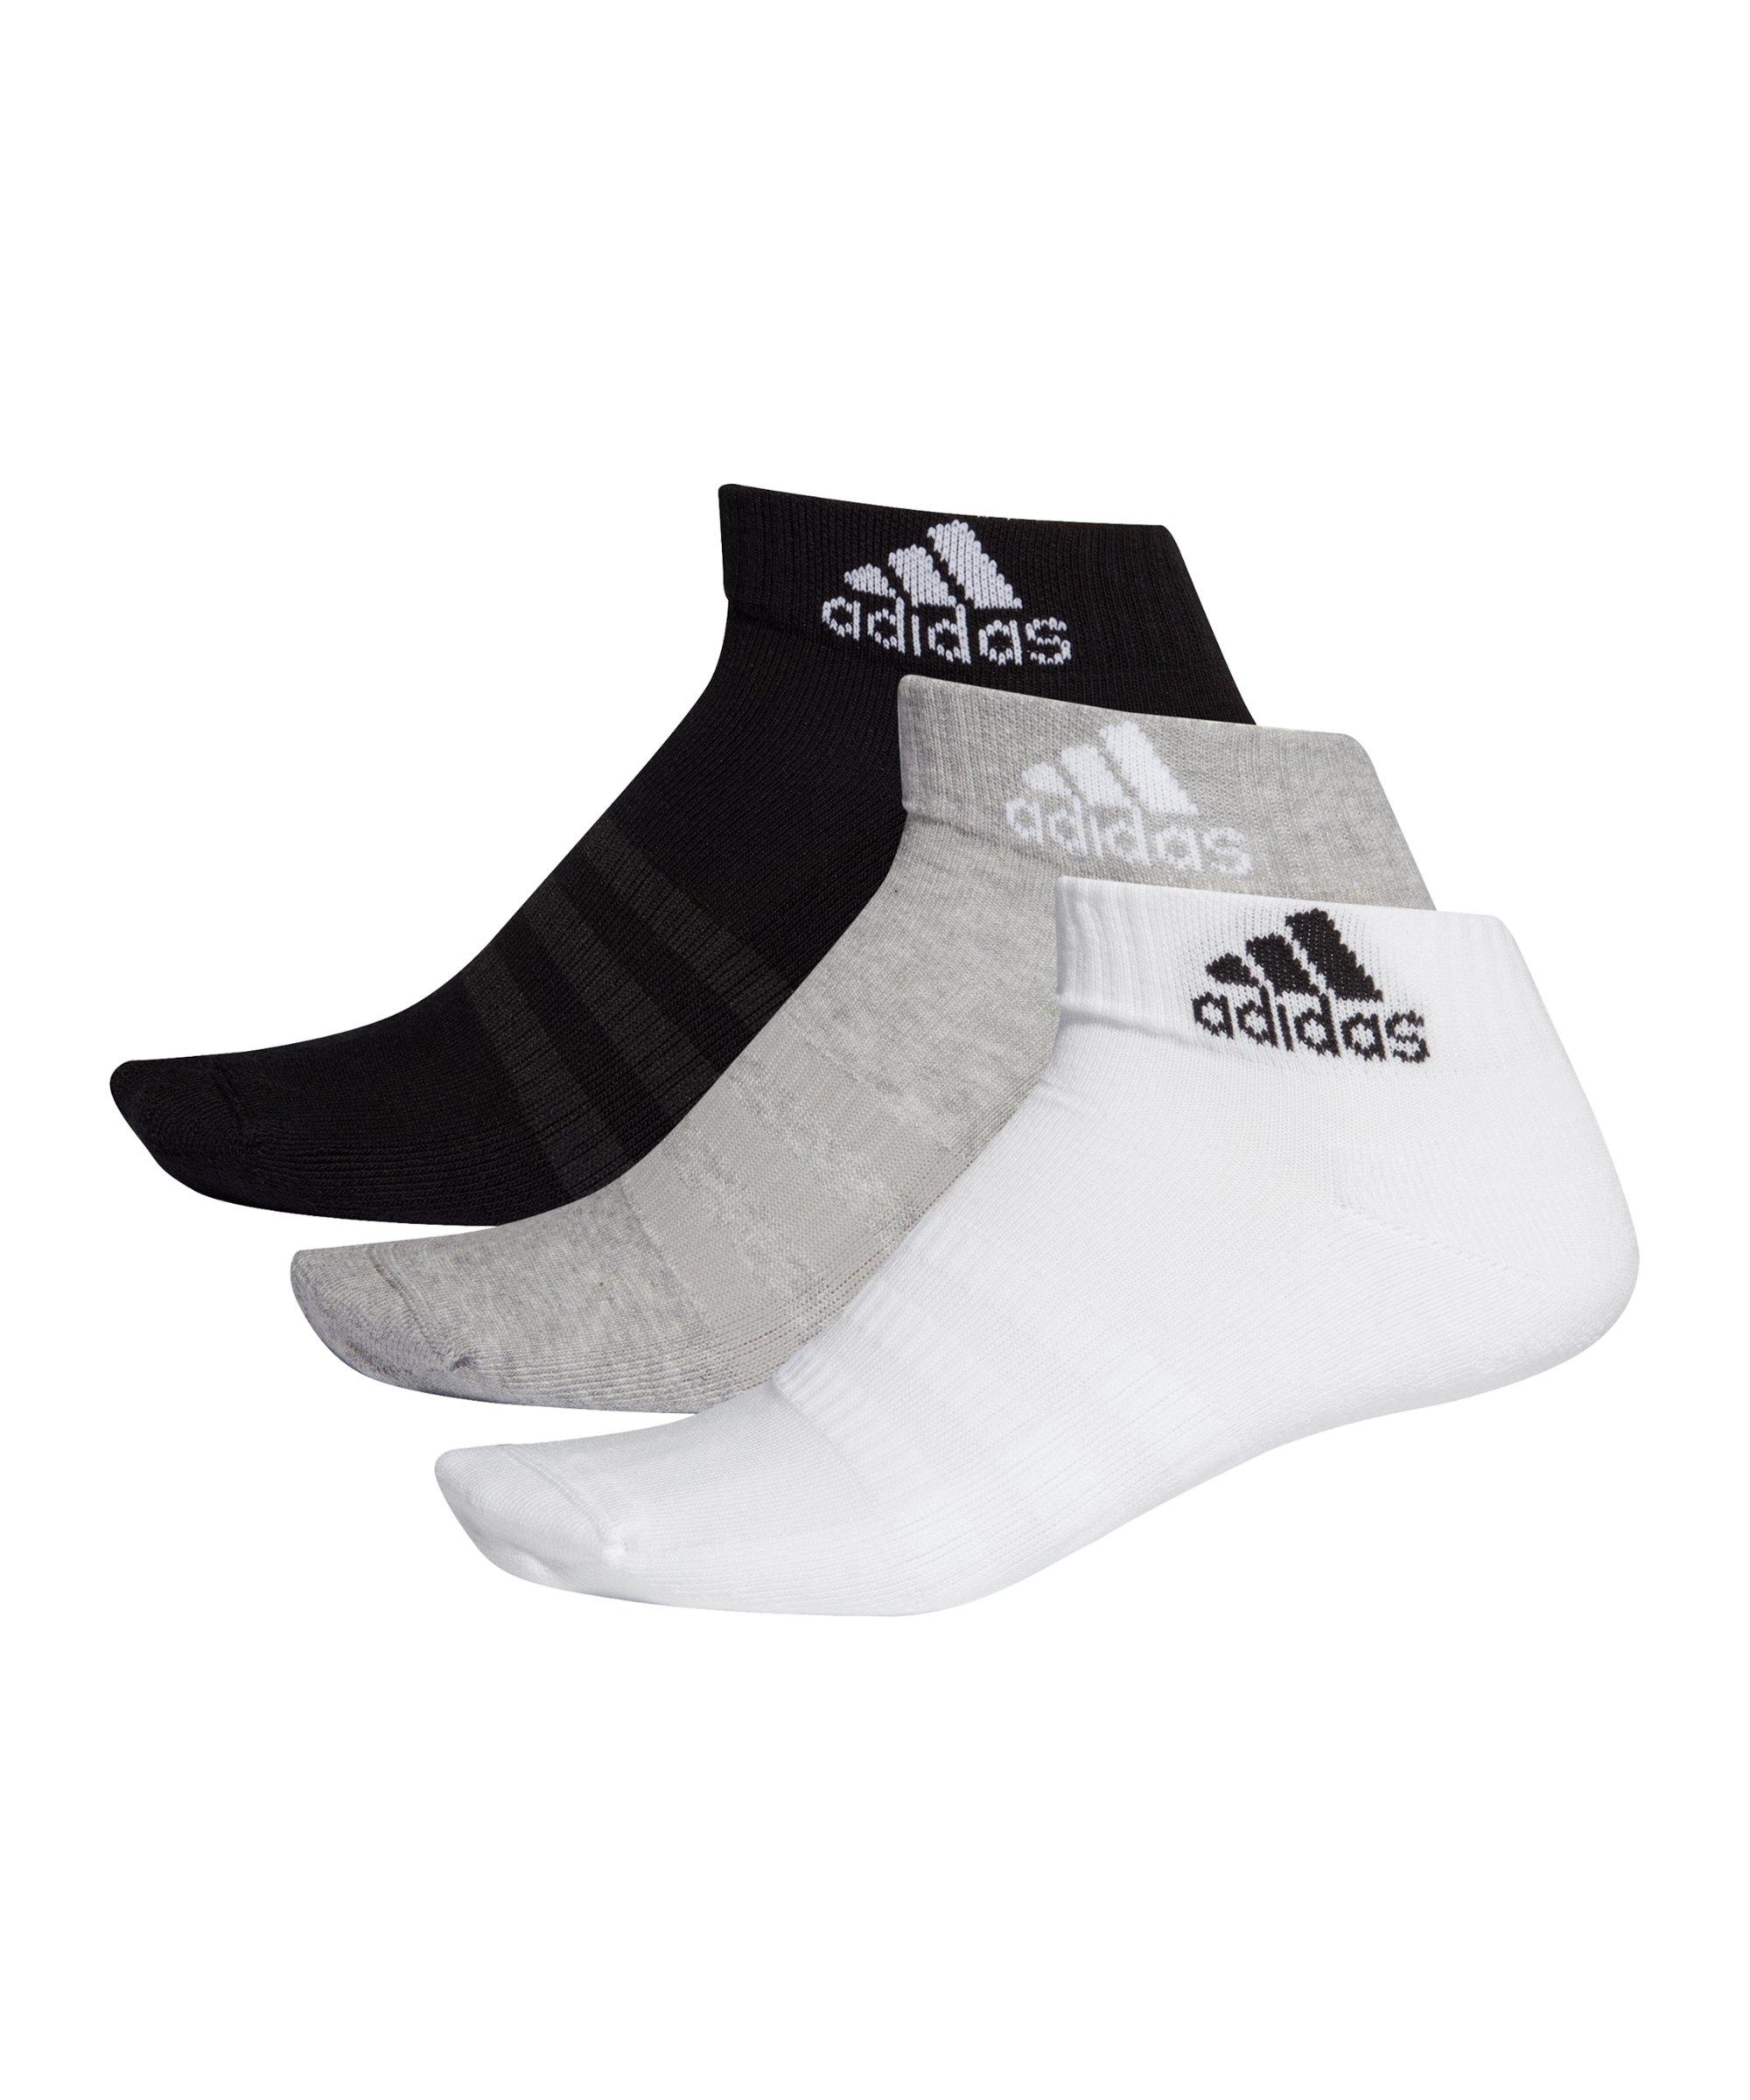 adidas Cushioned Ankle Socken 3er Pack Grau Weiss - grau